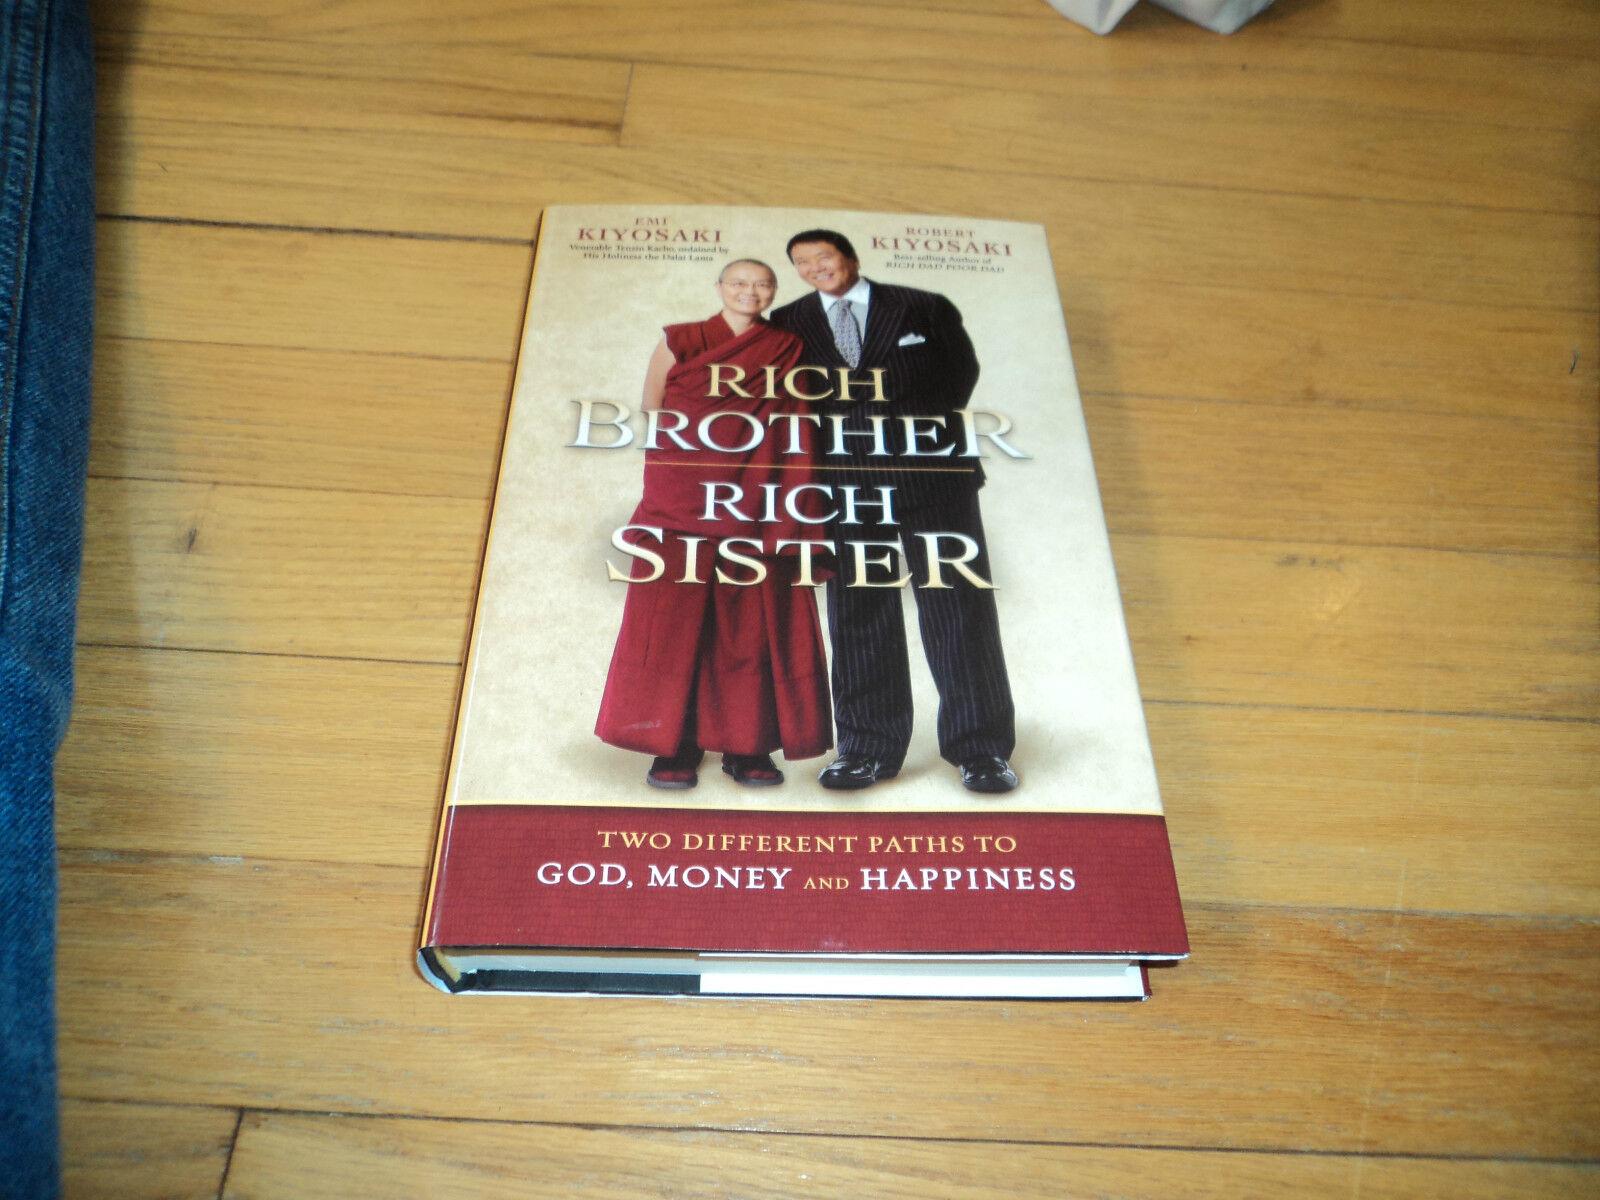 Rich Brother Rich Sister Robert Kiyosaki Emi Two Paths To God, Money & Happiness